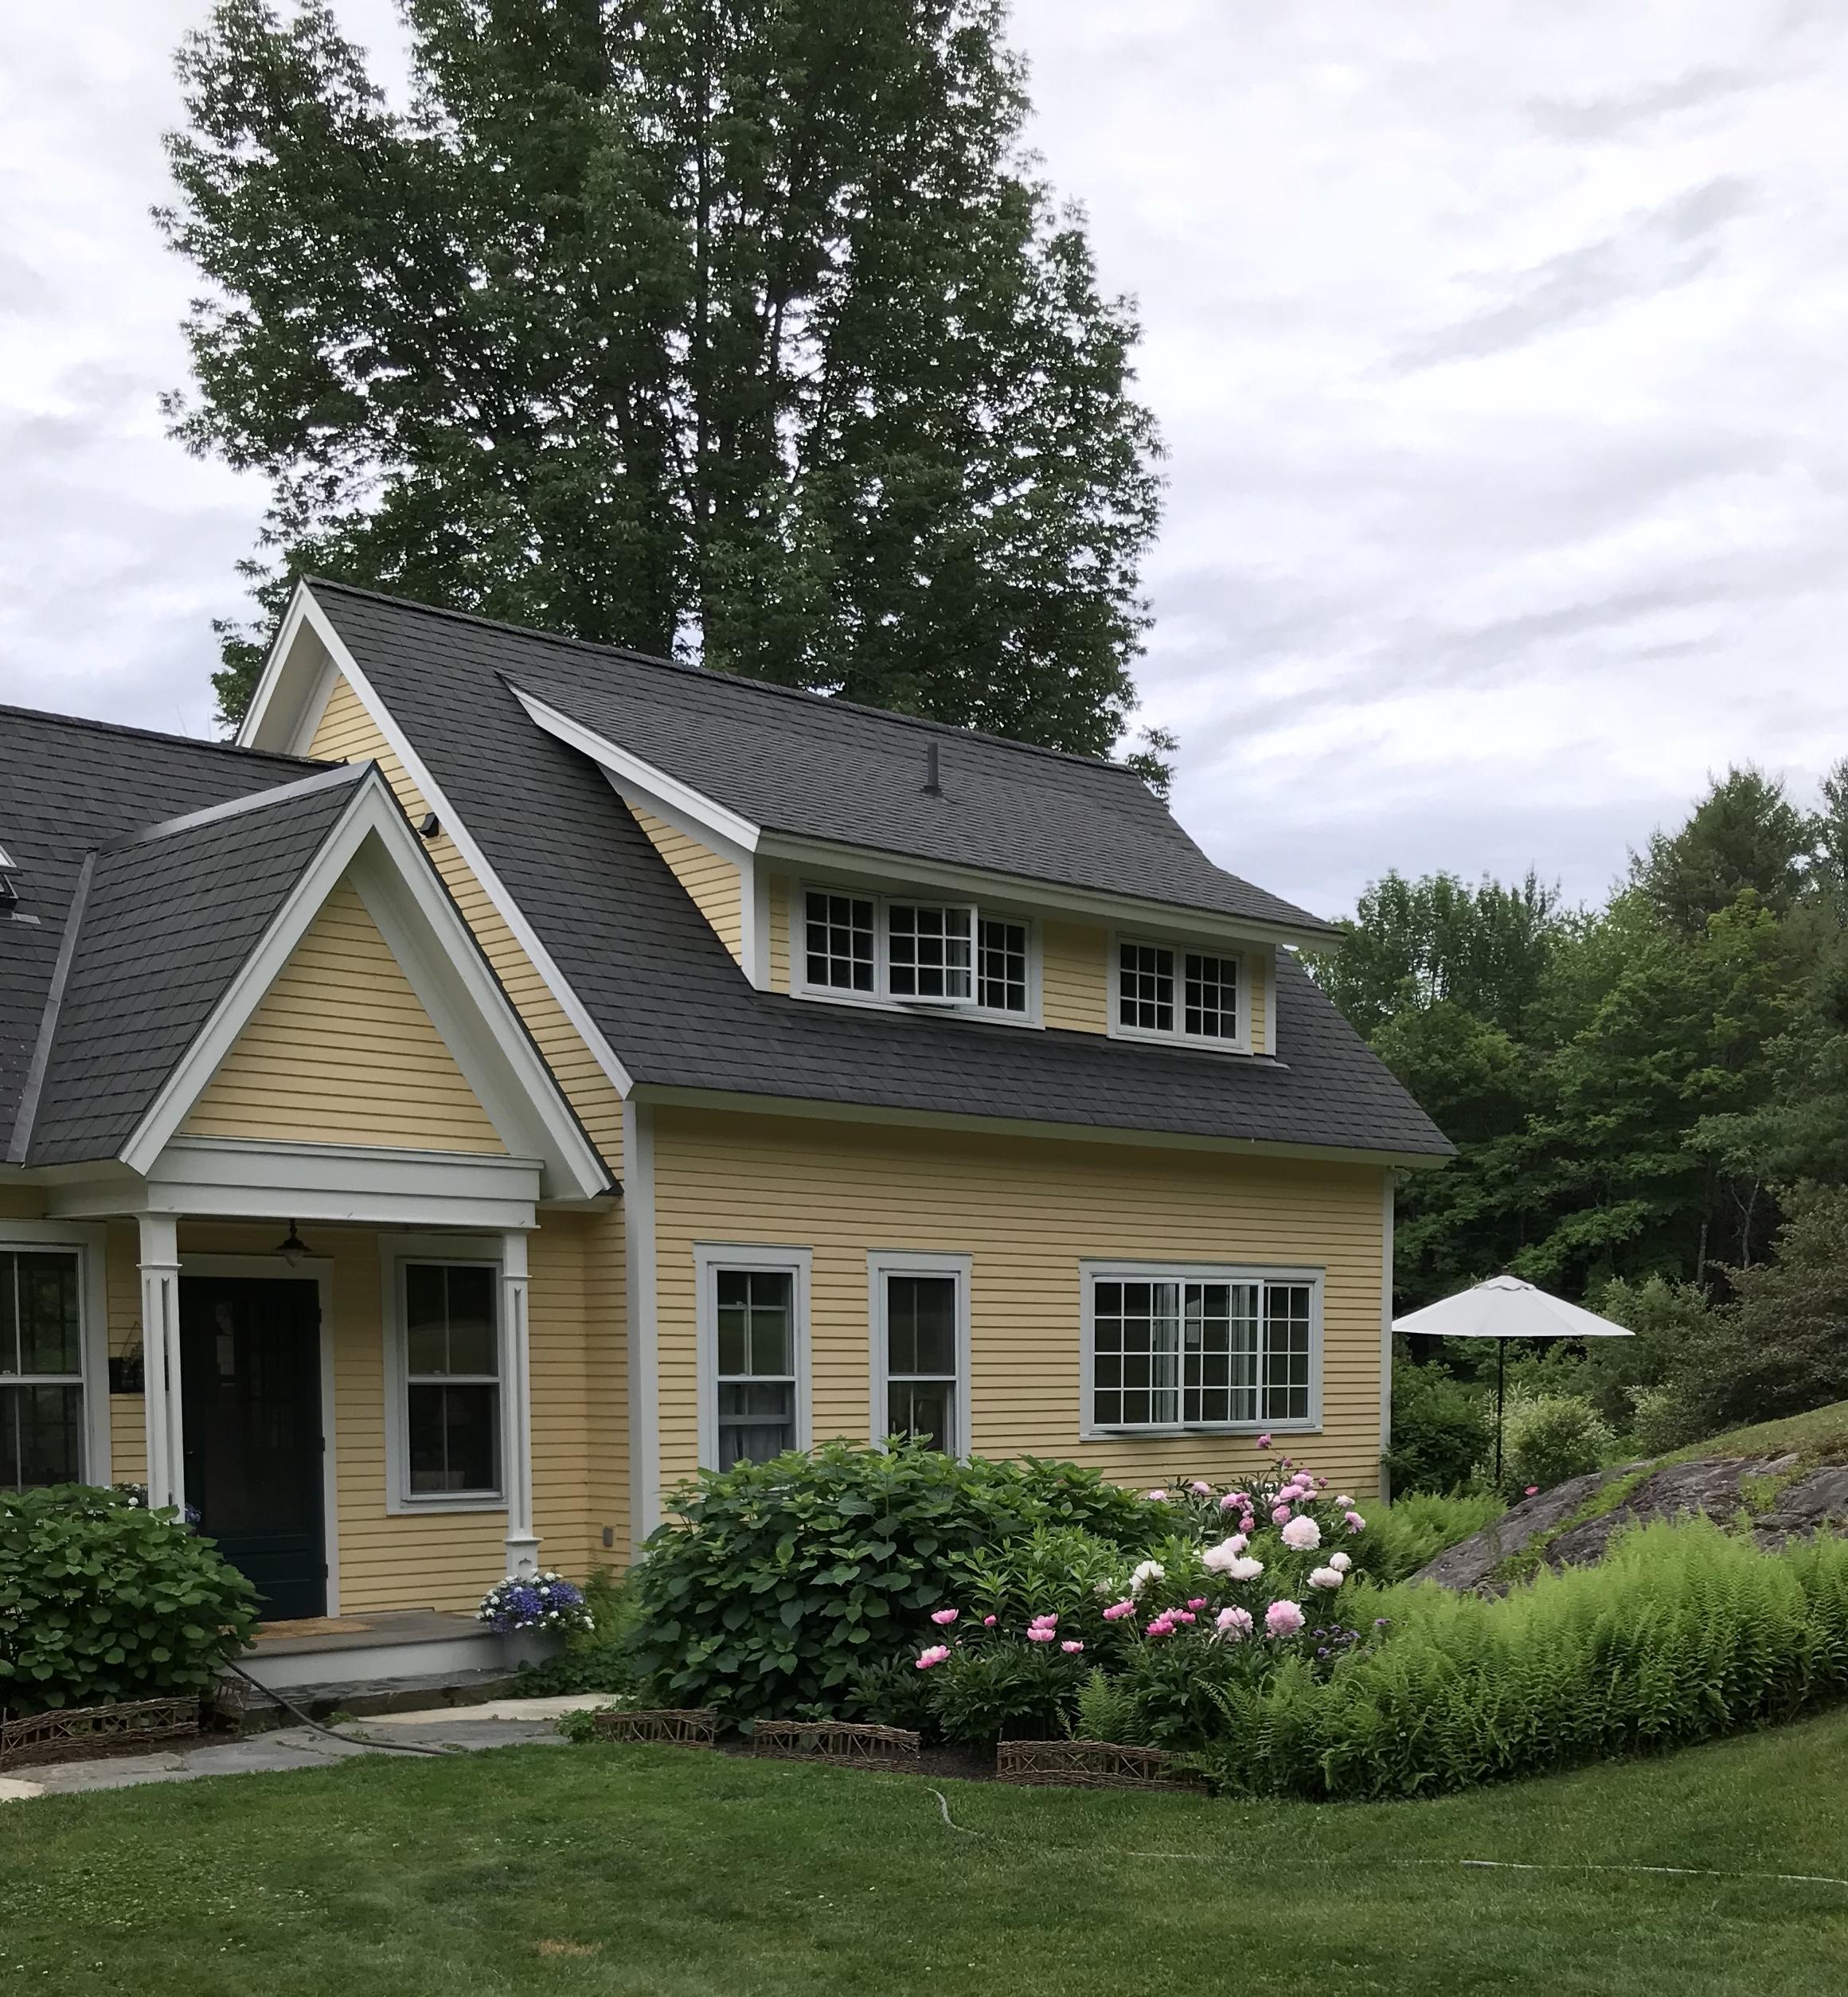 The Farmhouse At Happy Hill: Wedding Venue Near Hanover, NH